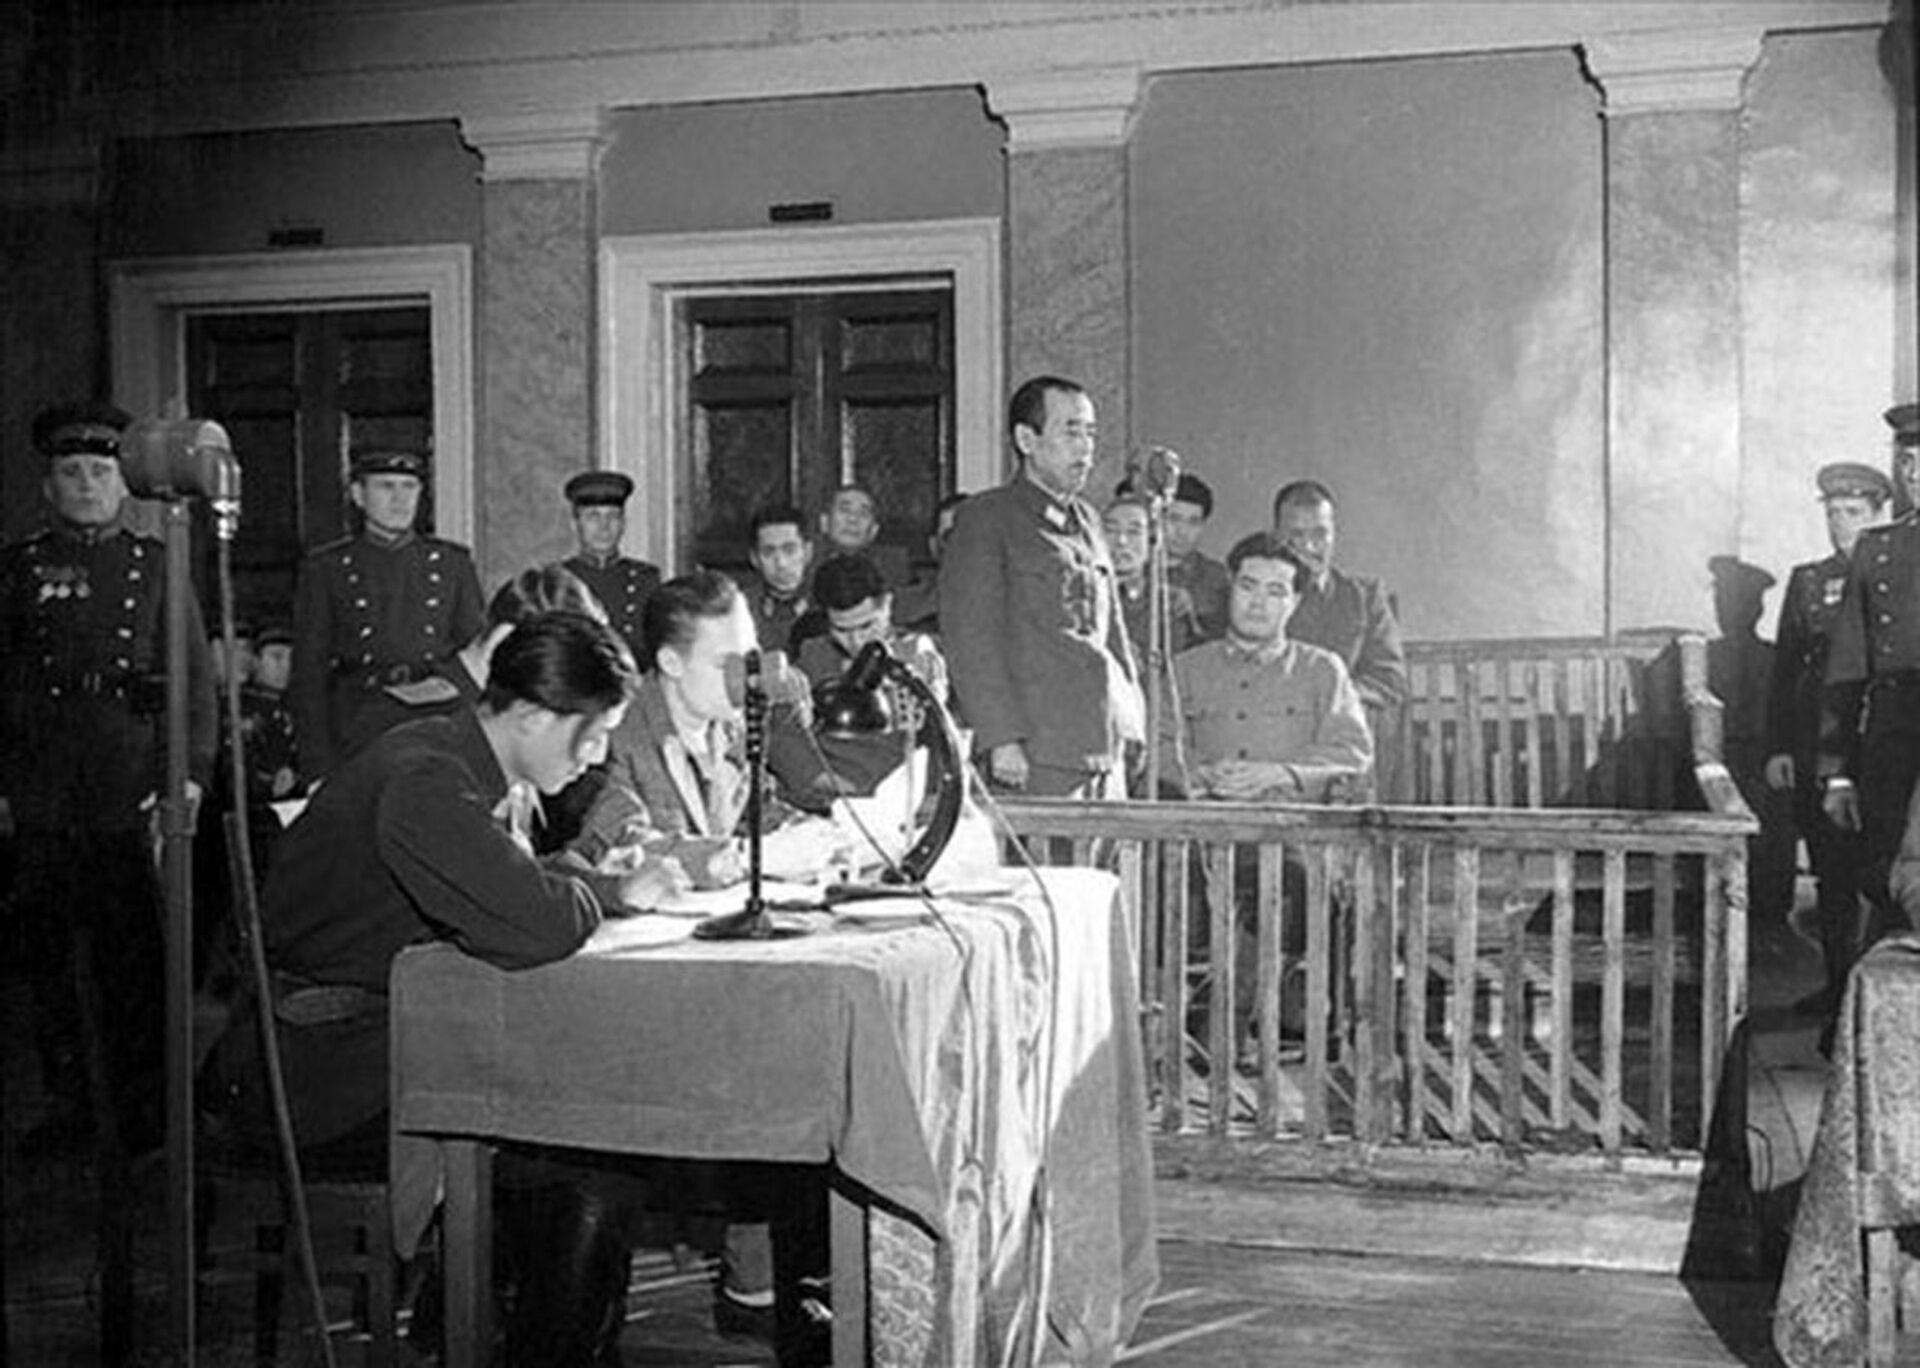 Otozo Yamada tại phiên tòa, Khabarovsk, 1949 - Sputnik Việt Nam, 1920, 05.10.2021